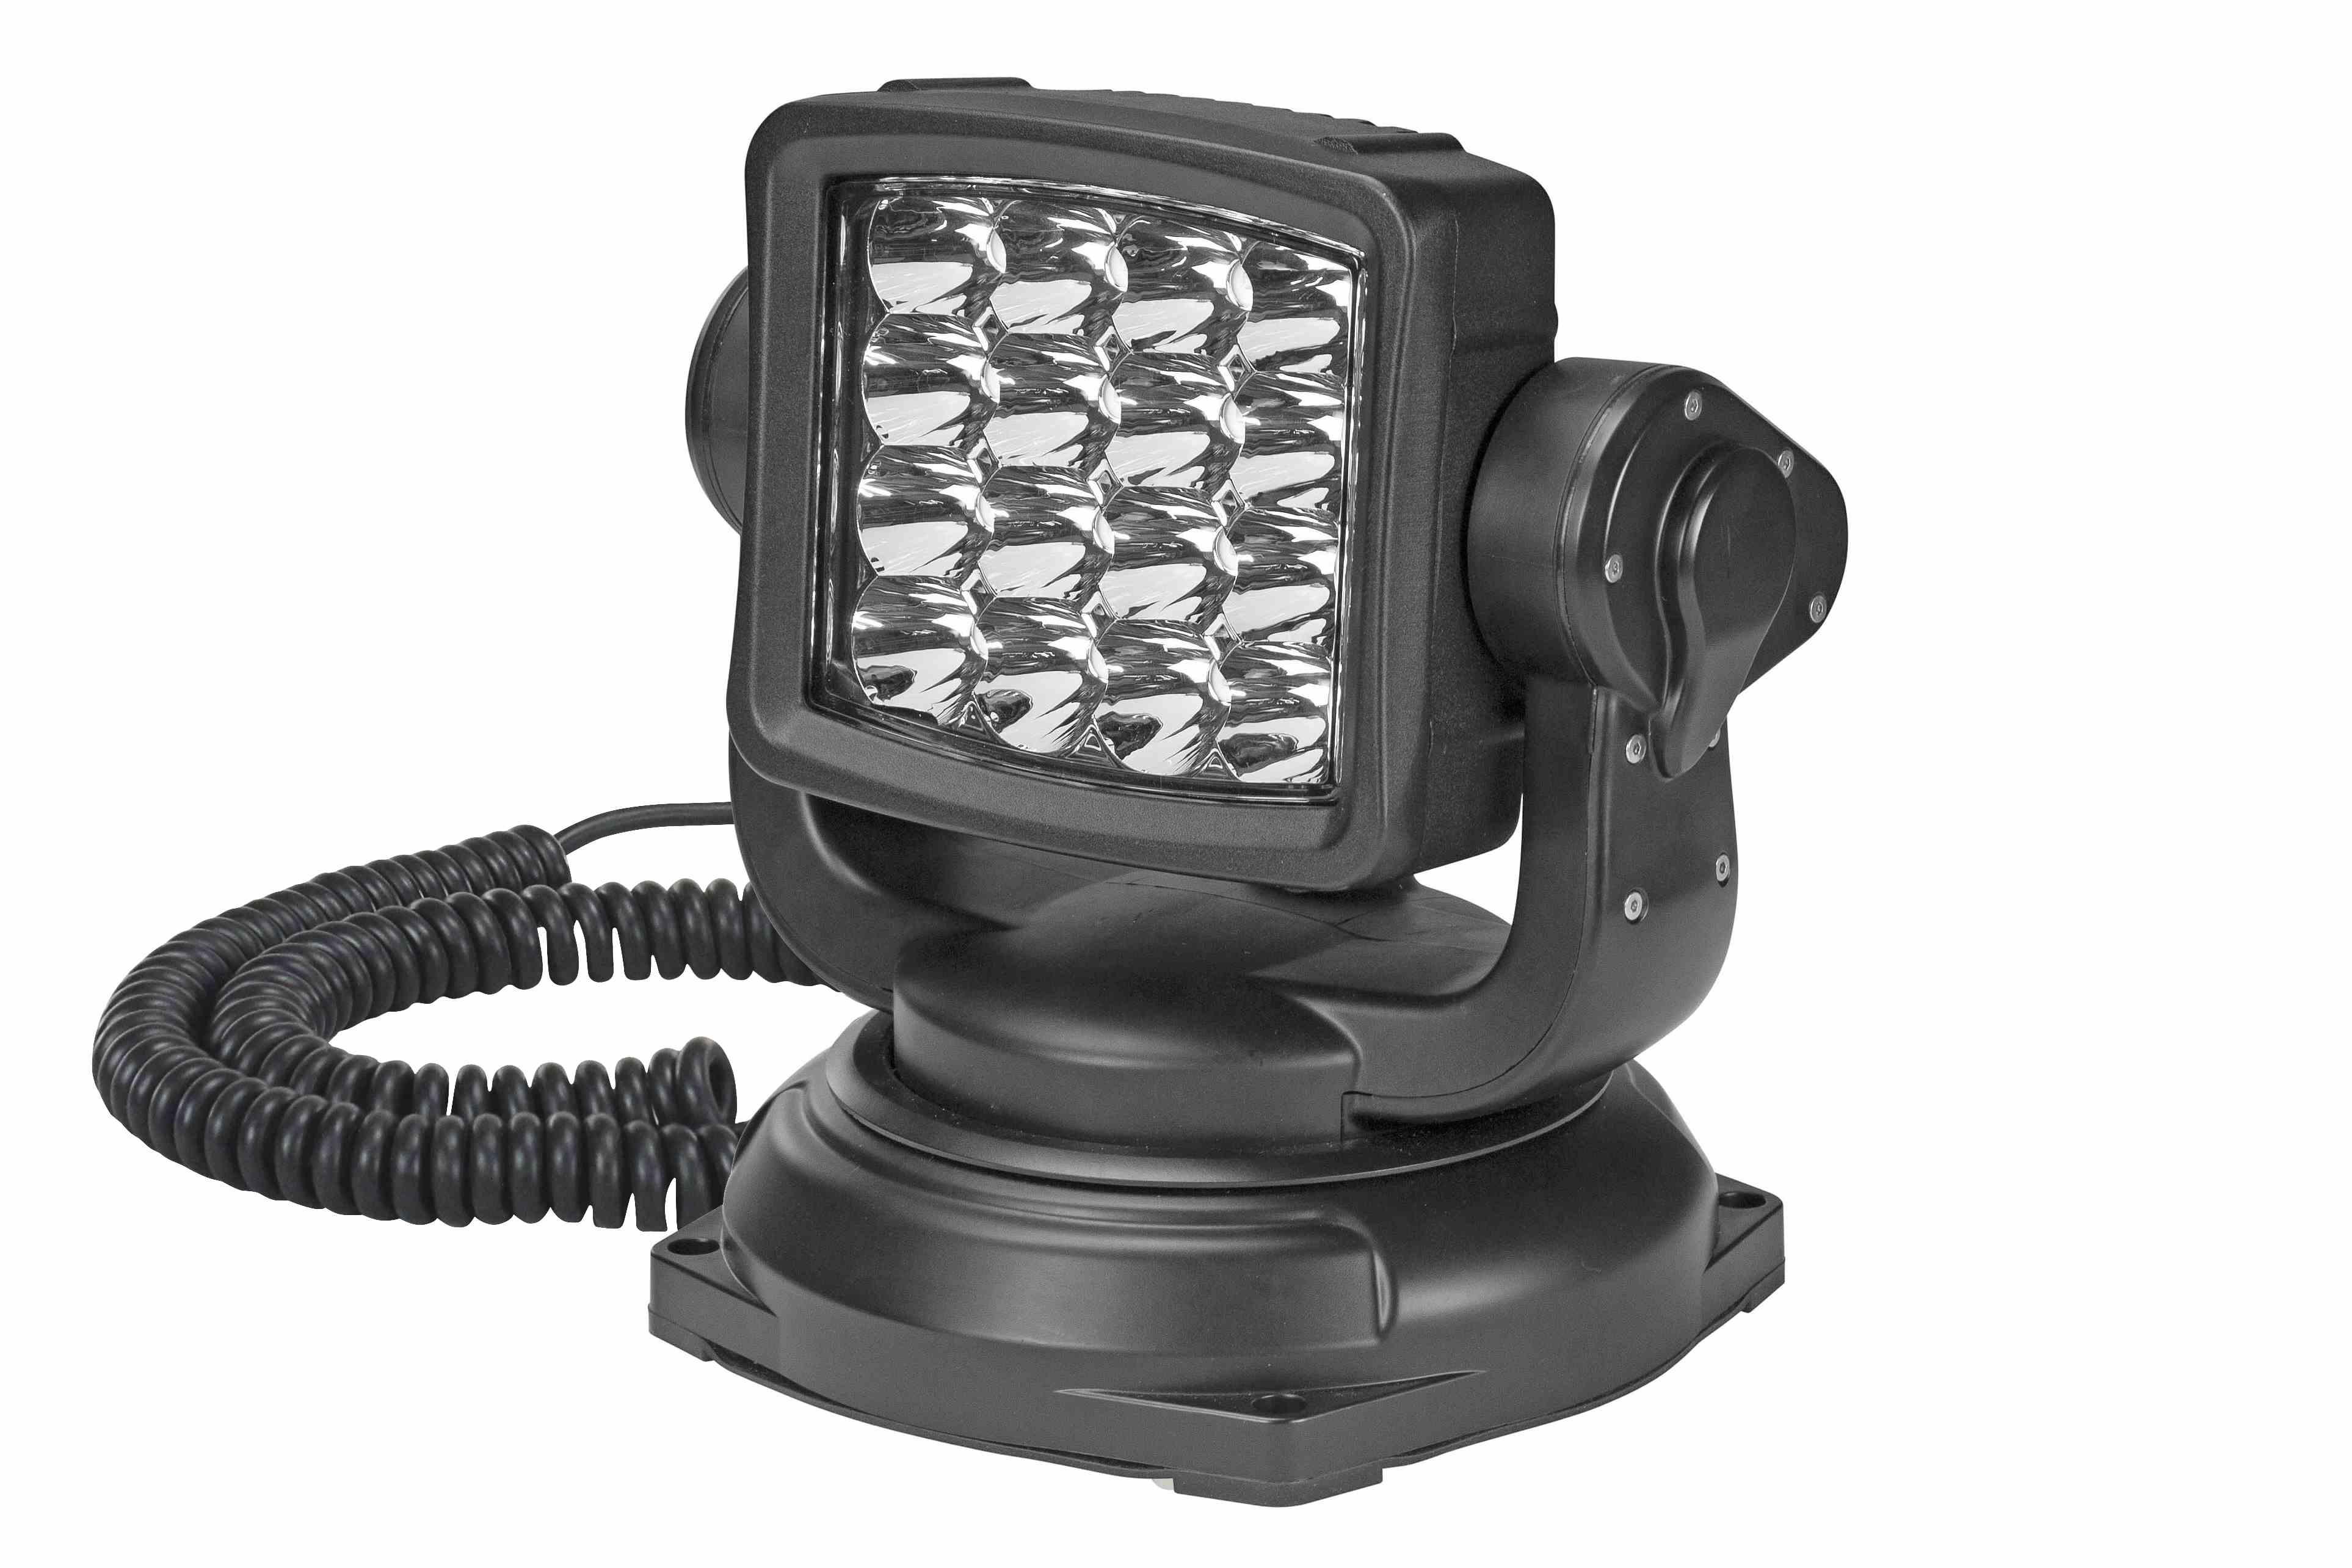 Gl 7900 Golight Radioray Portable Remote Control Spotlight Spot Light Wiring Diagram Hi Res Image 3